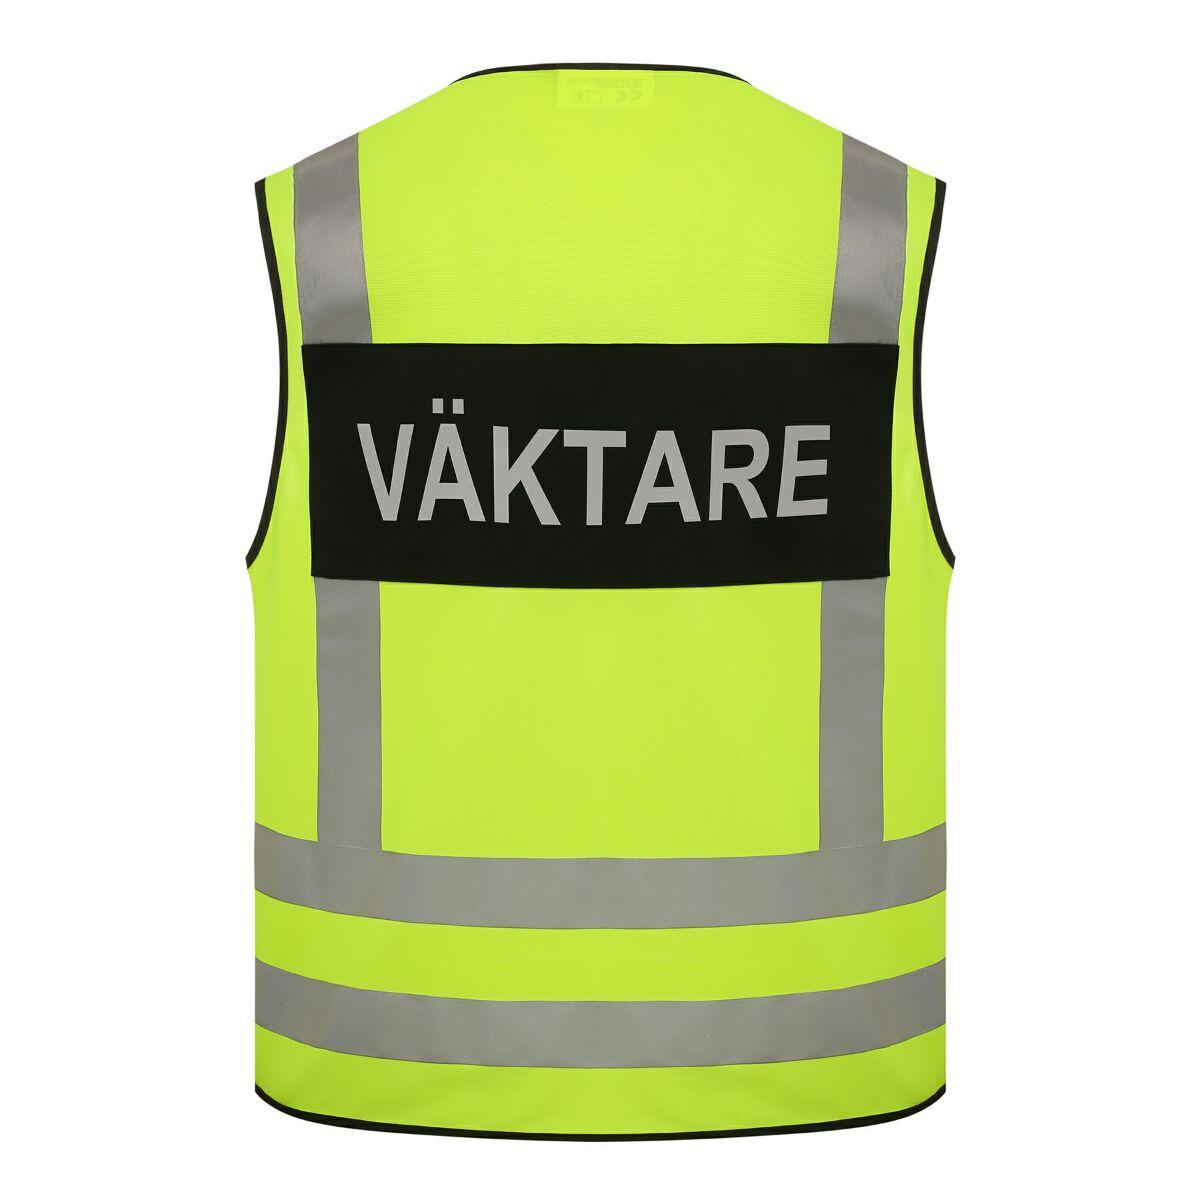 OVbutiken.se - Väktare Reflexväst ea8cbf44929f9